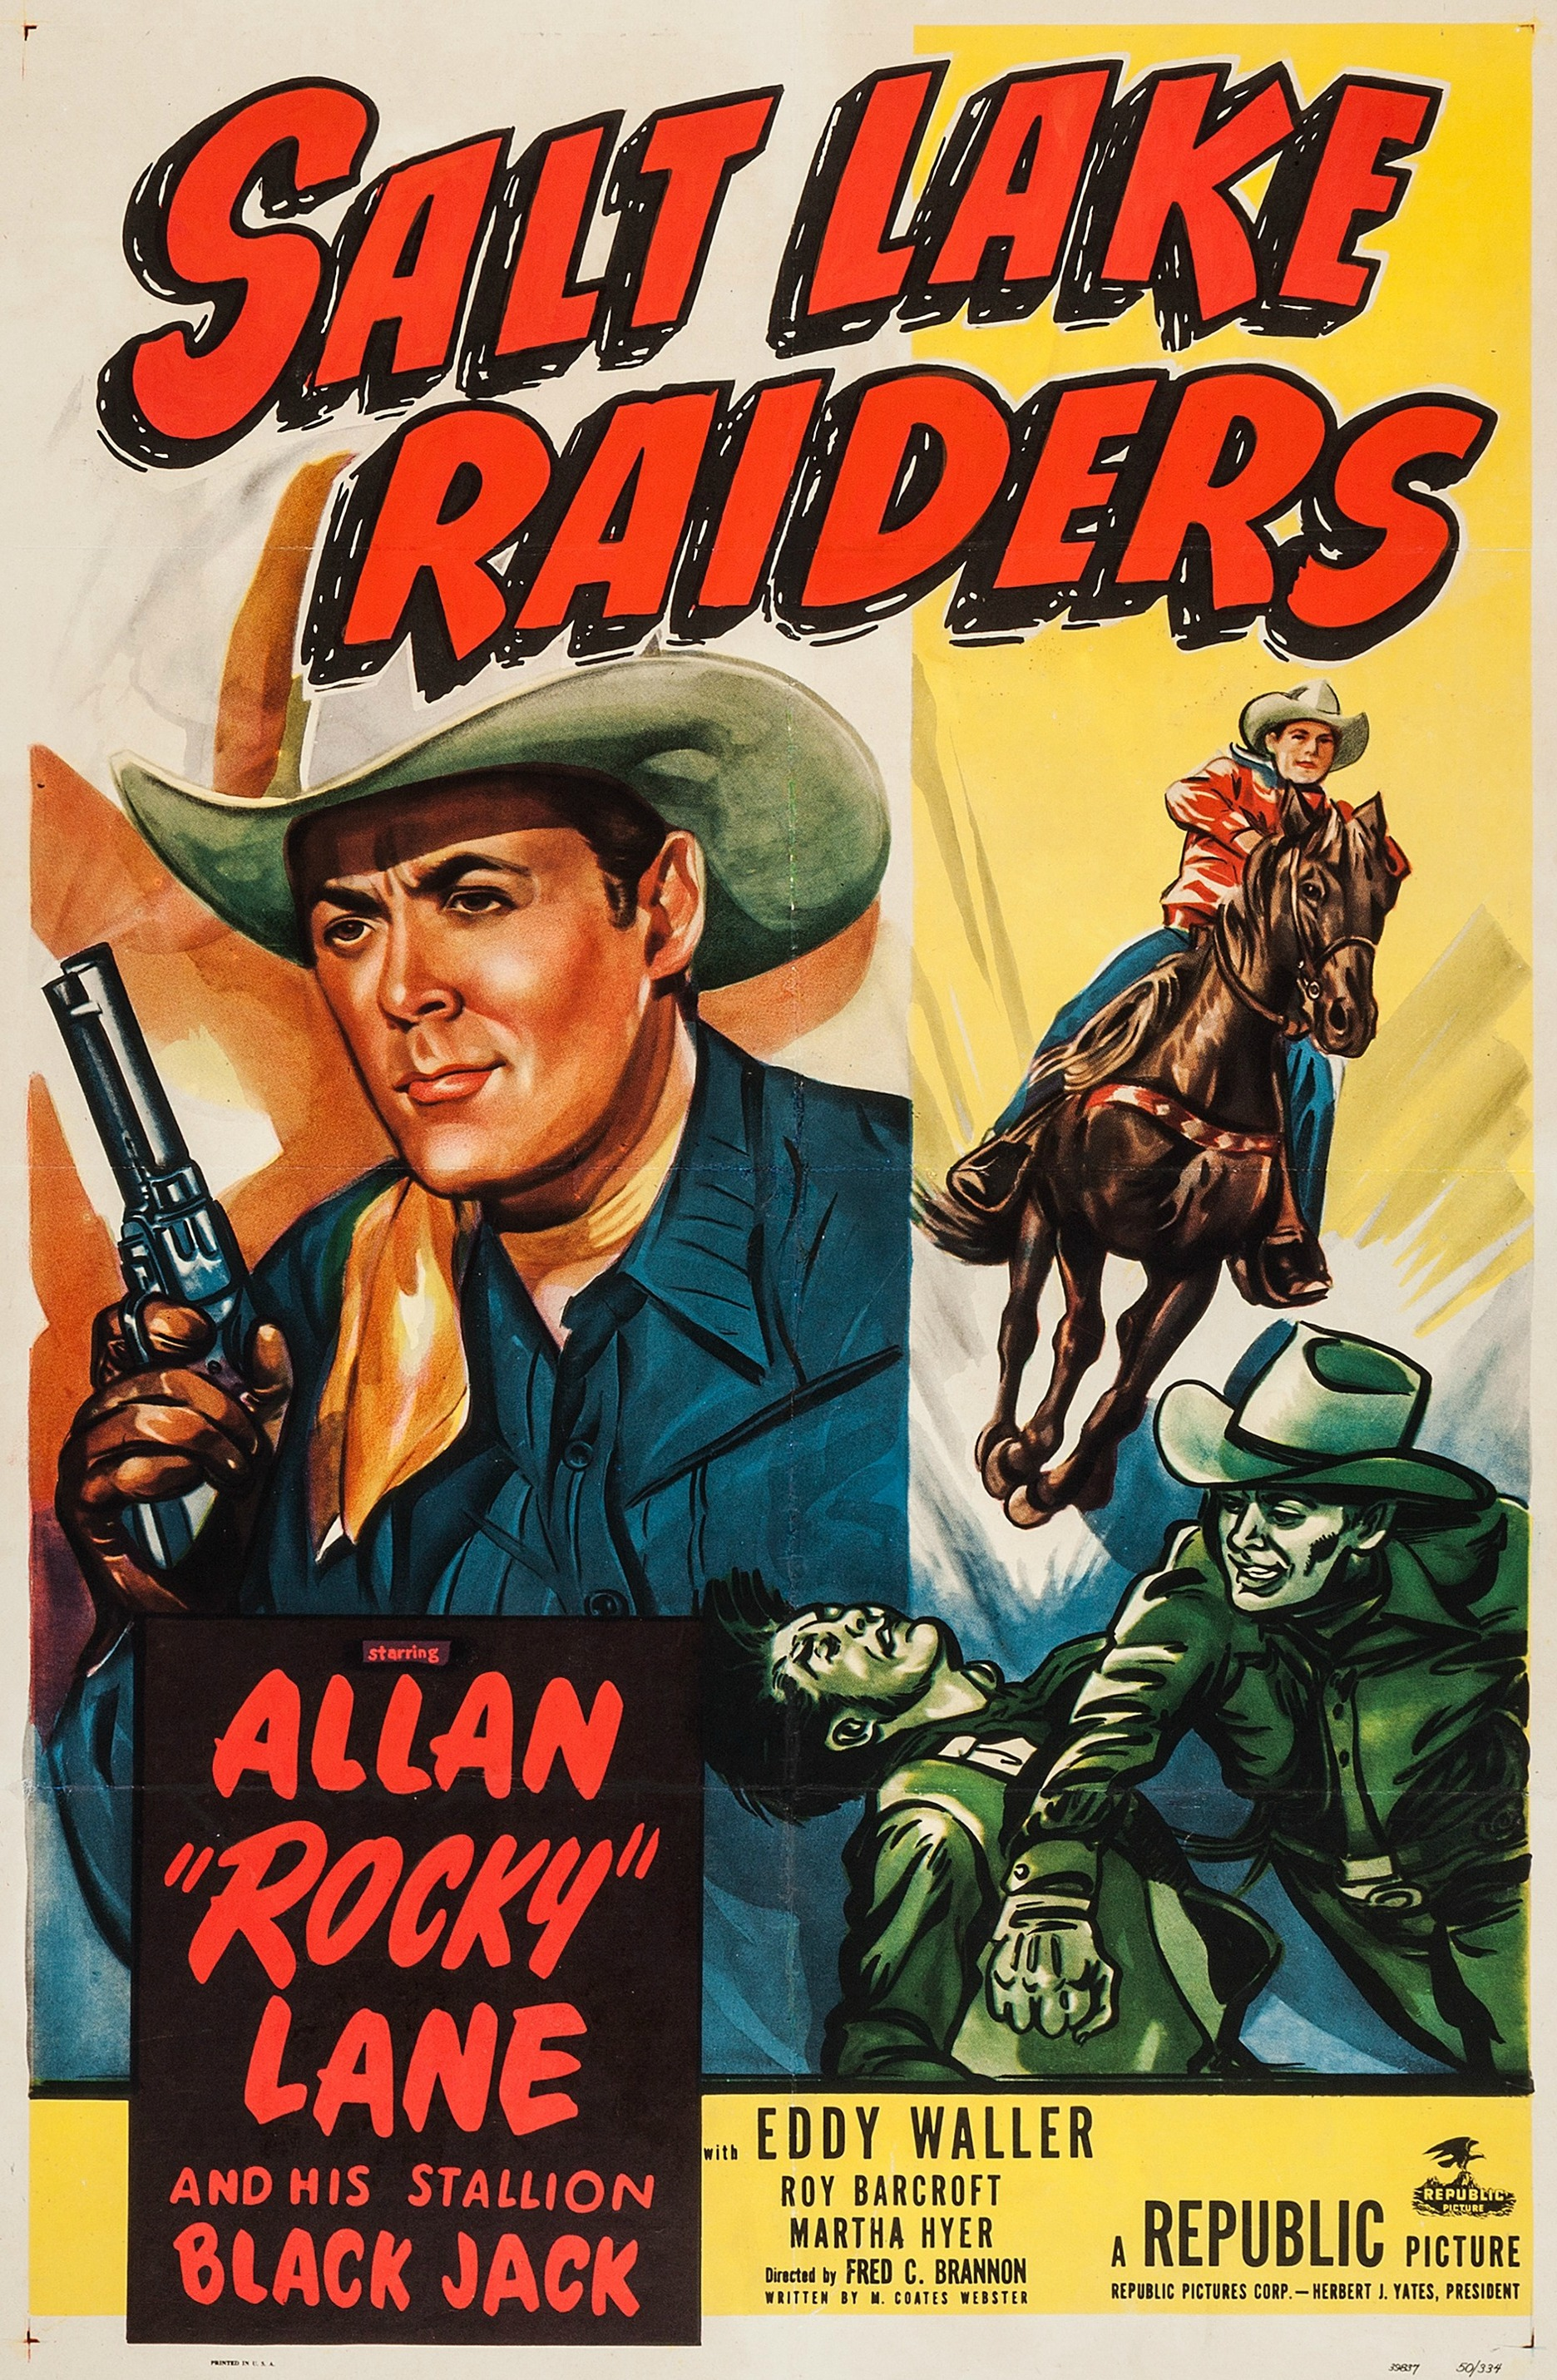 Allan Lane and Black Jack in Salt Lake Raiders (1950)